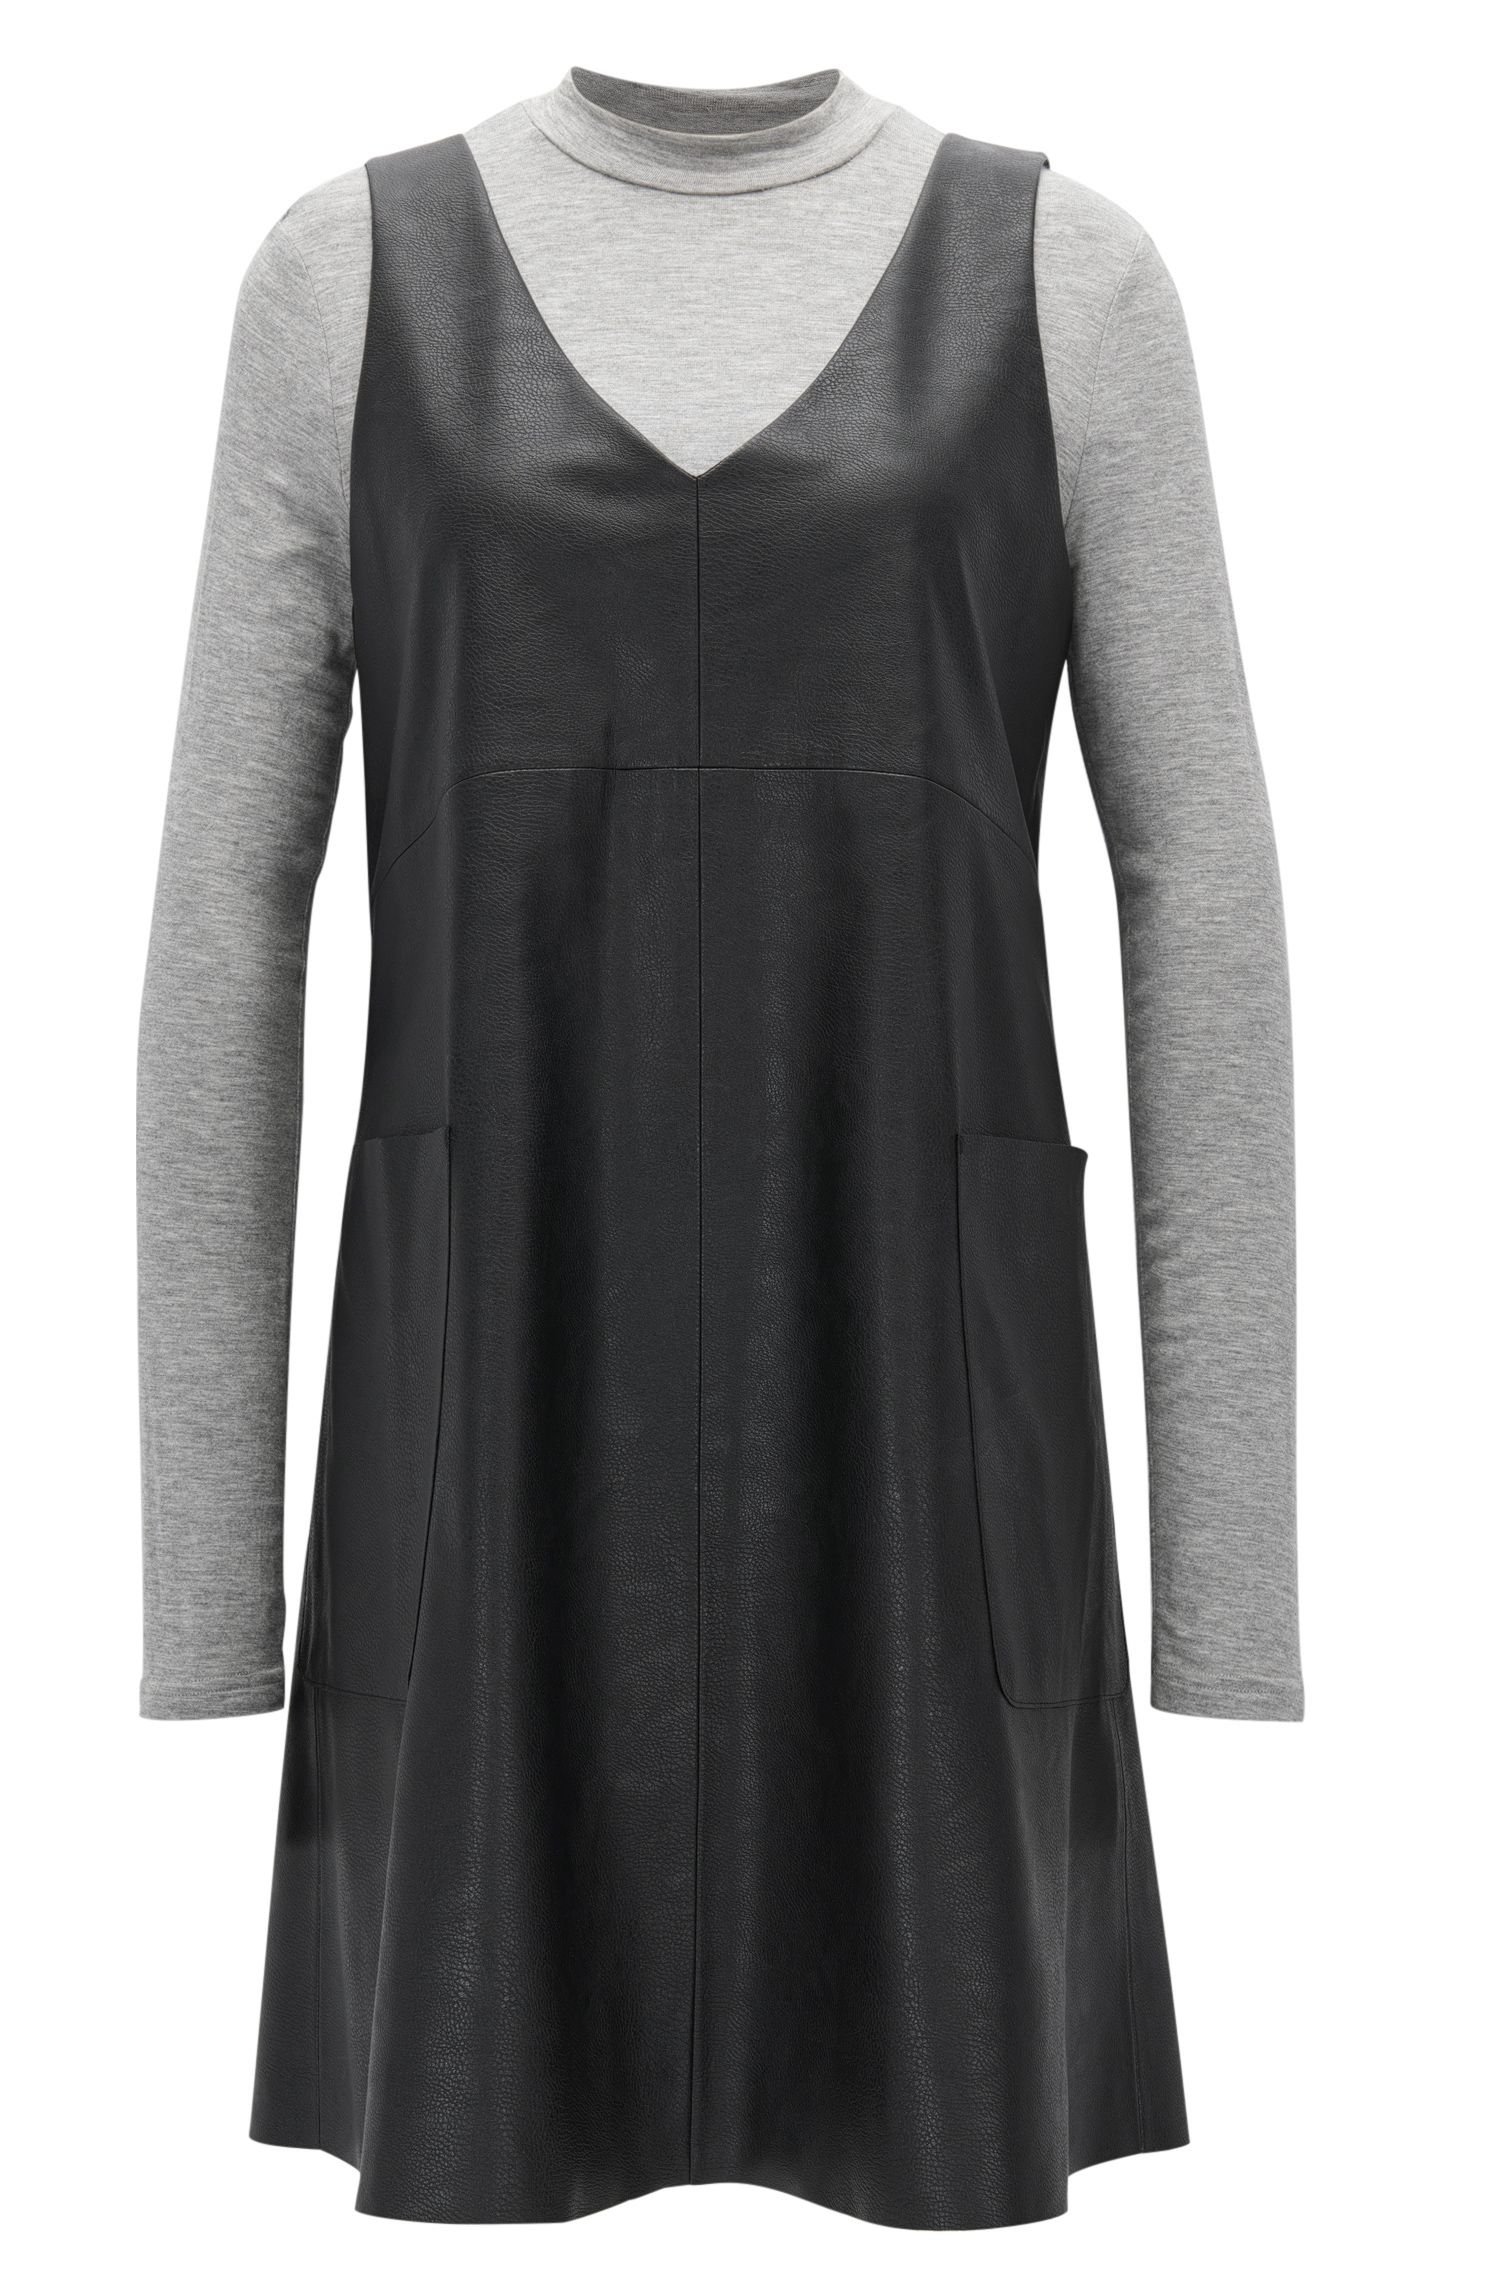 2-in-1-Kleid aus Kunstleder